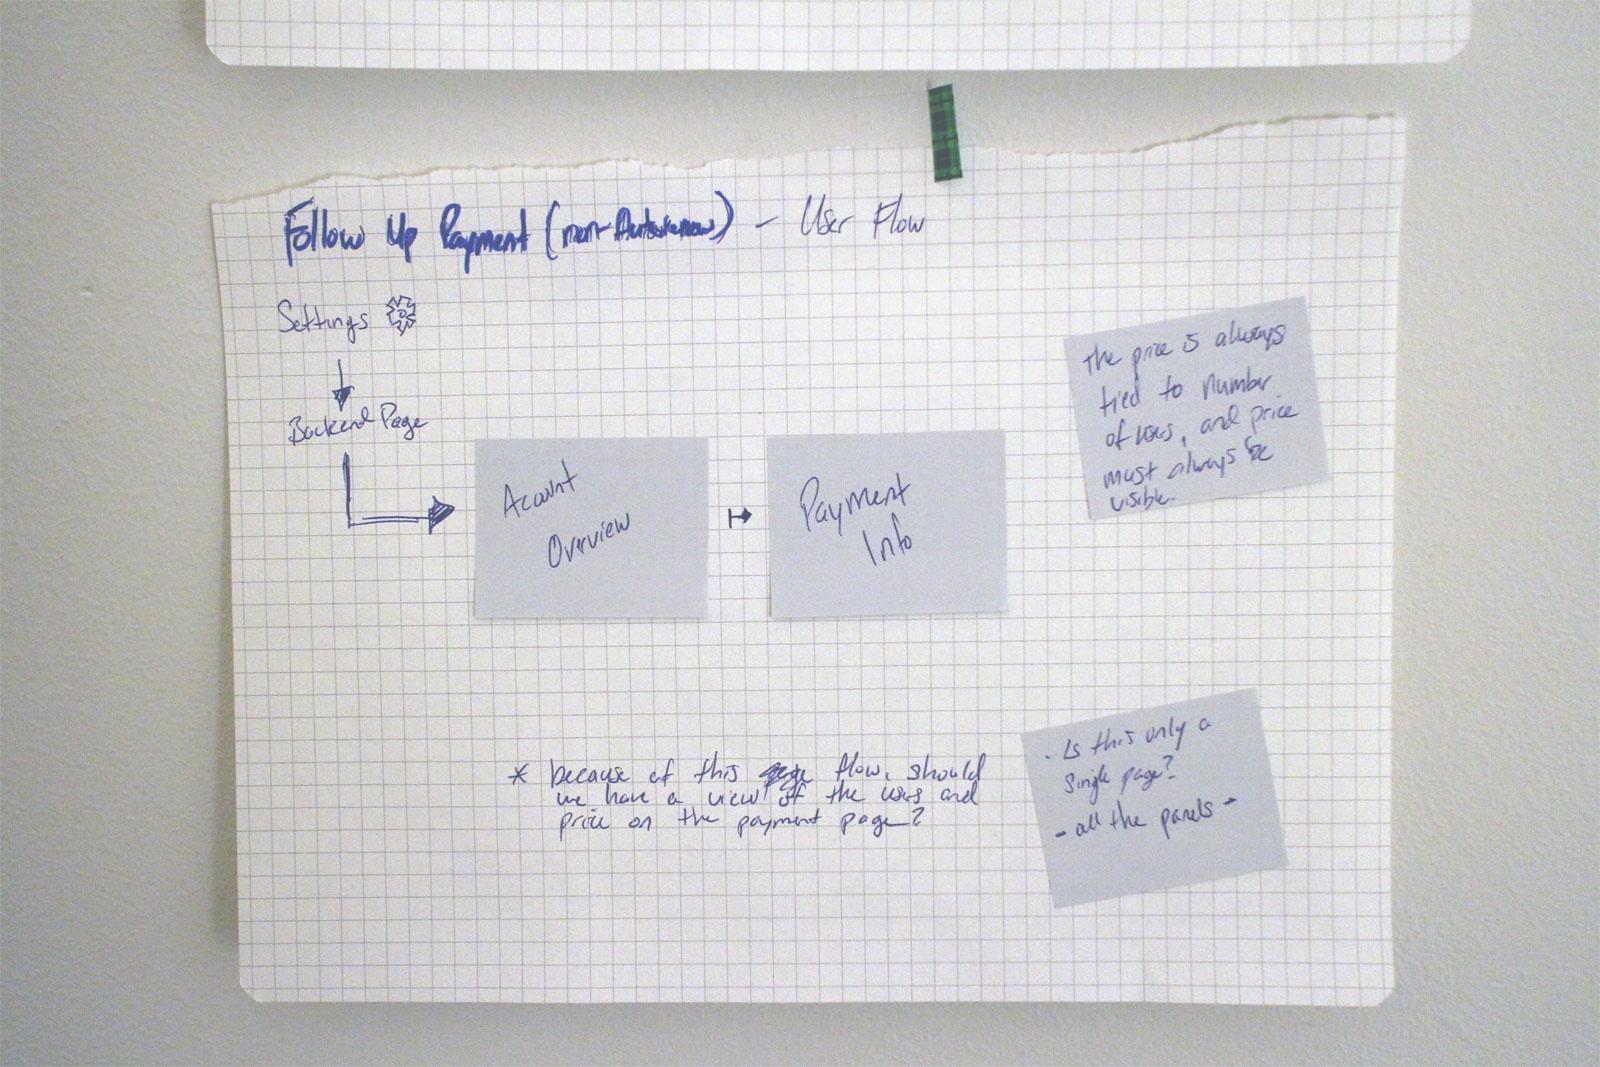 Follow Up Payment (non-Autorenew) User Flow